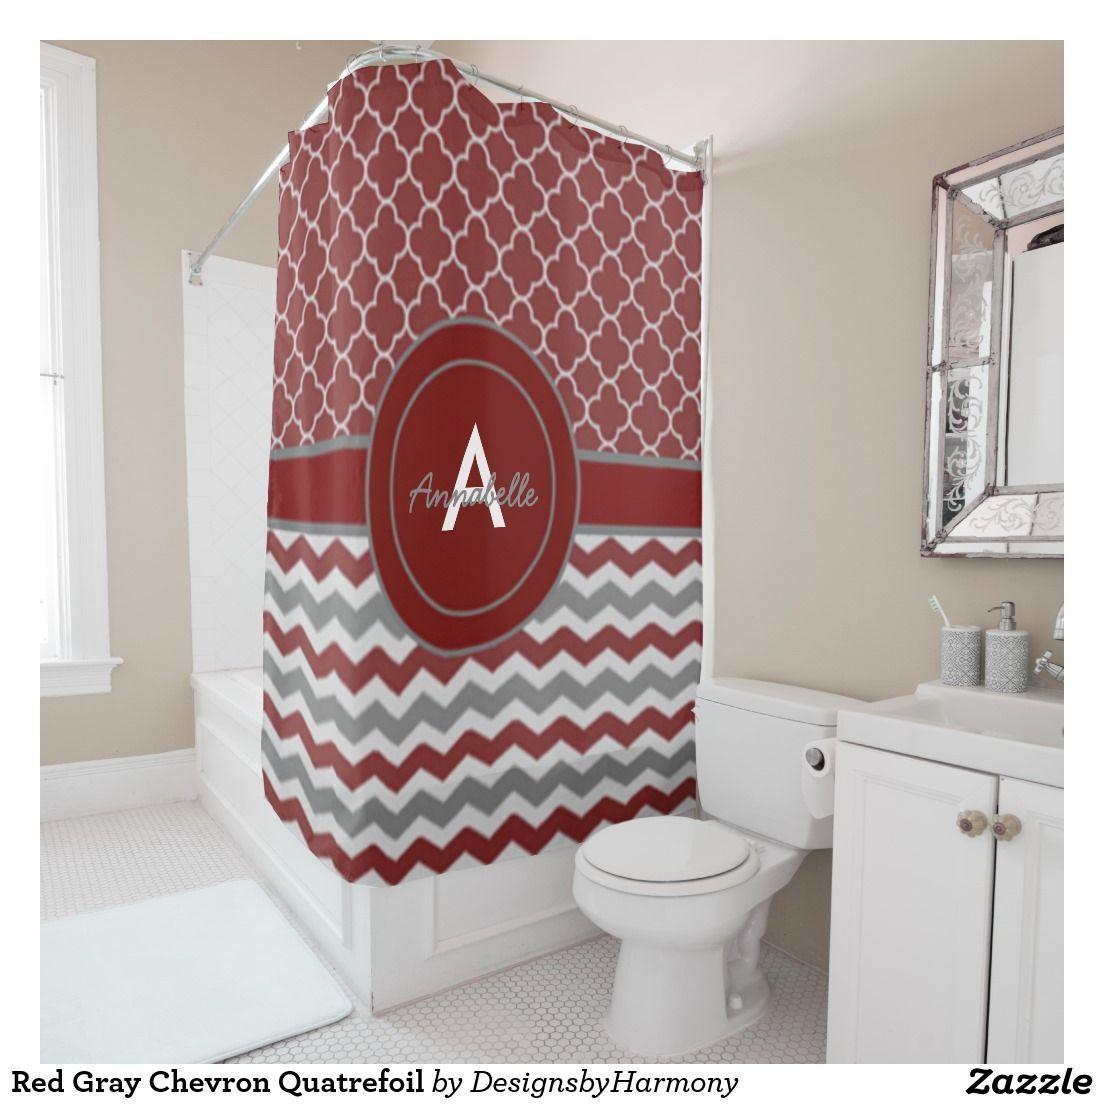 Red Gray Chevron Quatrefoil Shower Curtain